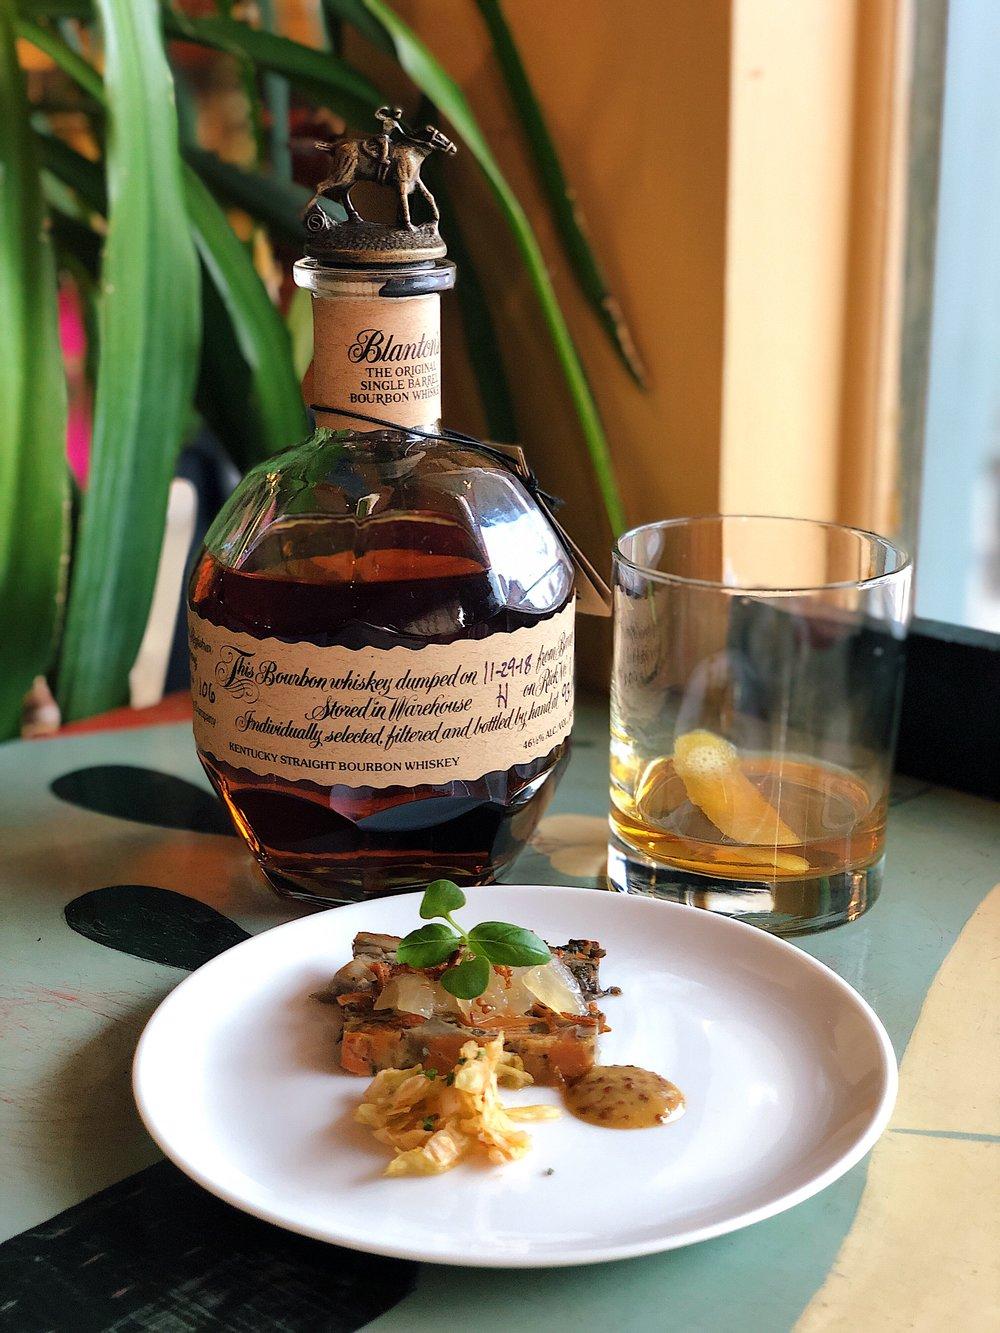 wine-wise-events-portland-maine-bourbon-cocktail-walk93898D3D-3FEA-47D4-8128-6E82BB715280.jpg